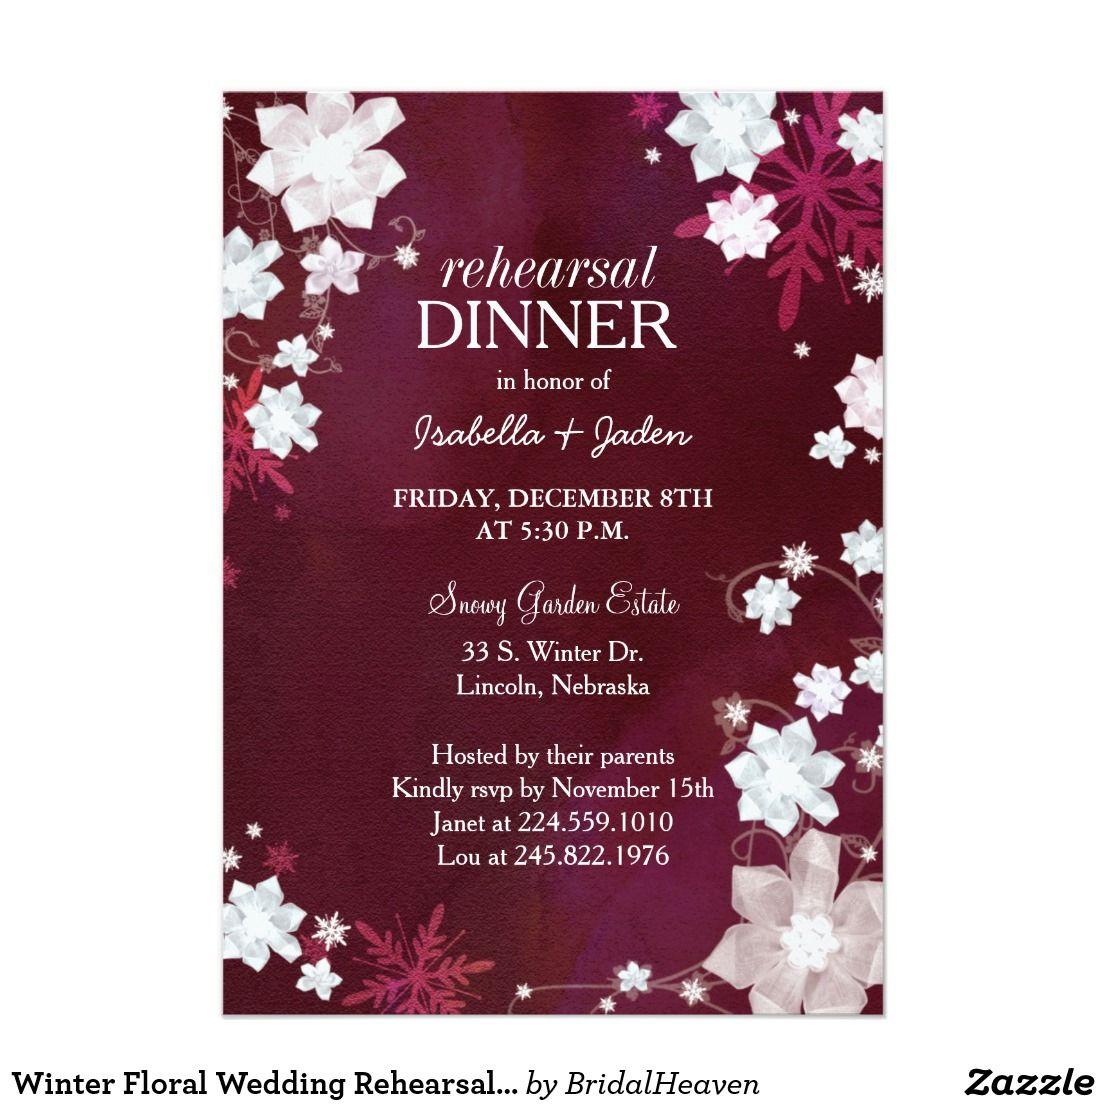 Winter Floral Wedding Rehearsal Dinner Invitation | Pinterest ...